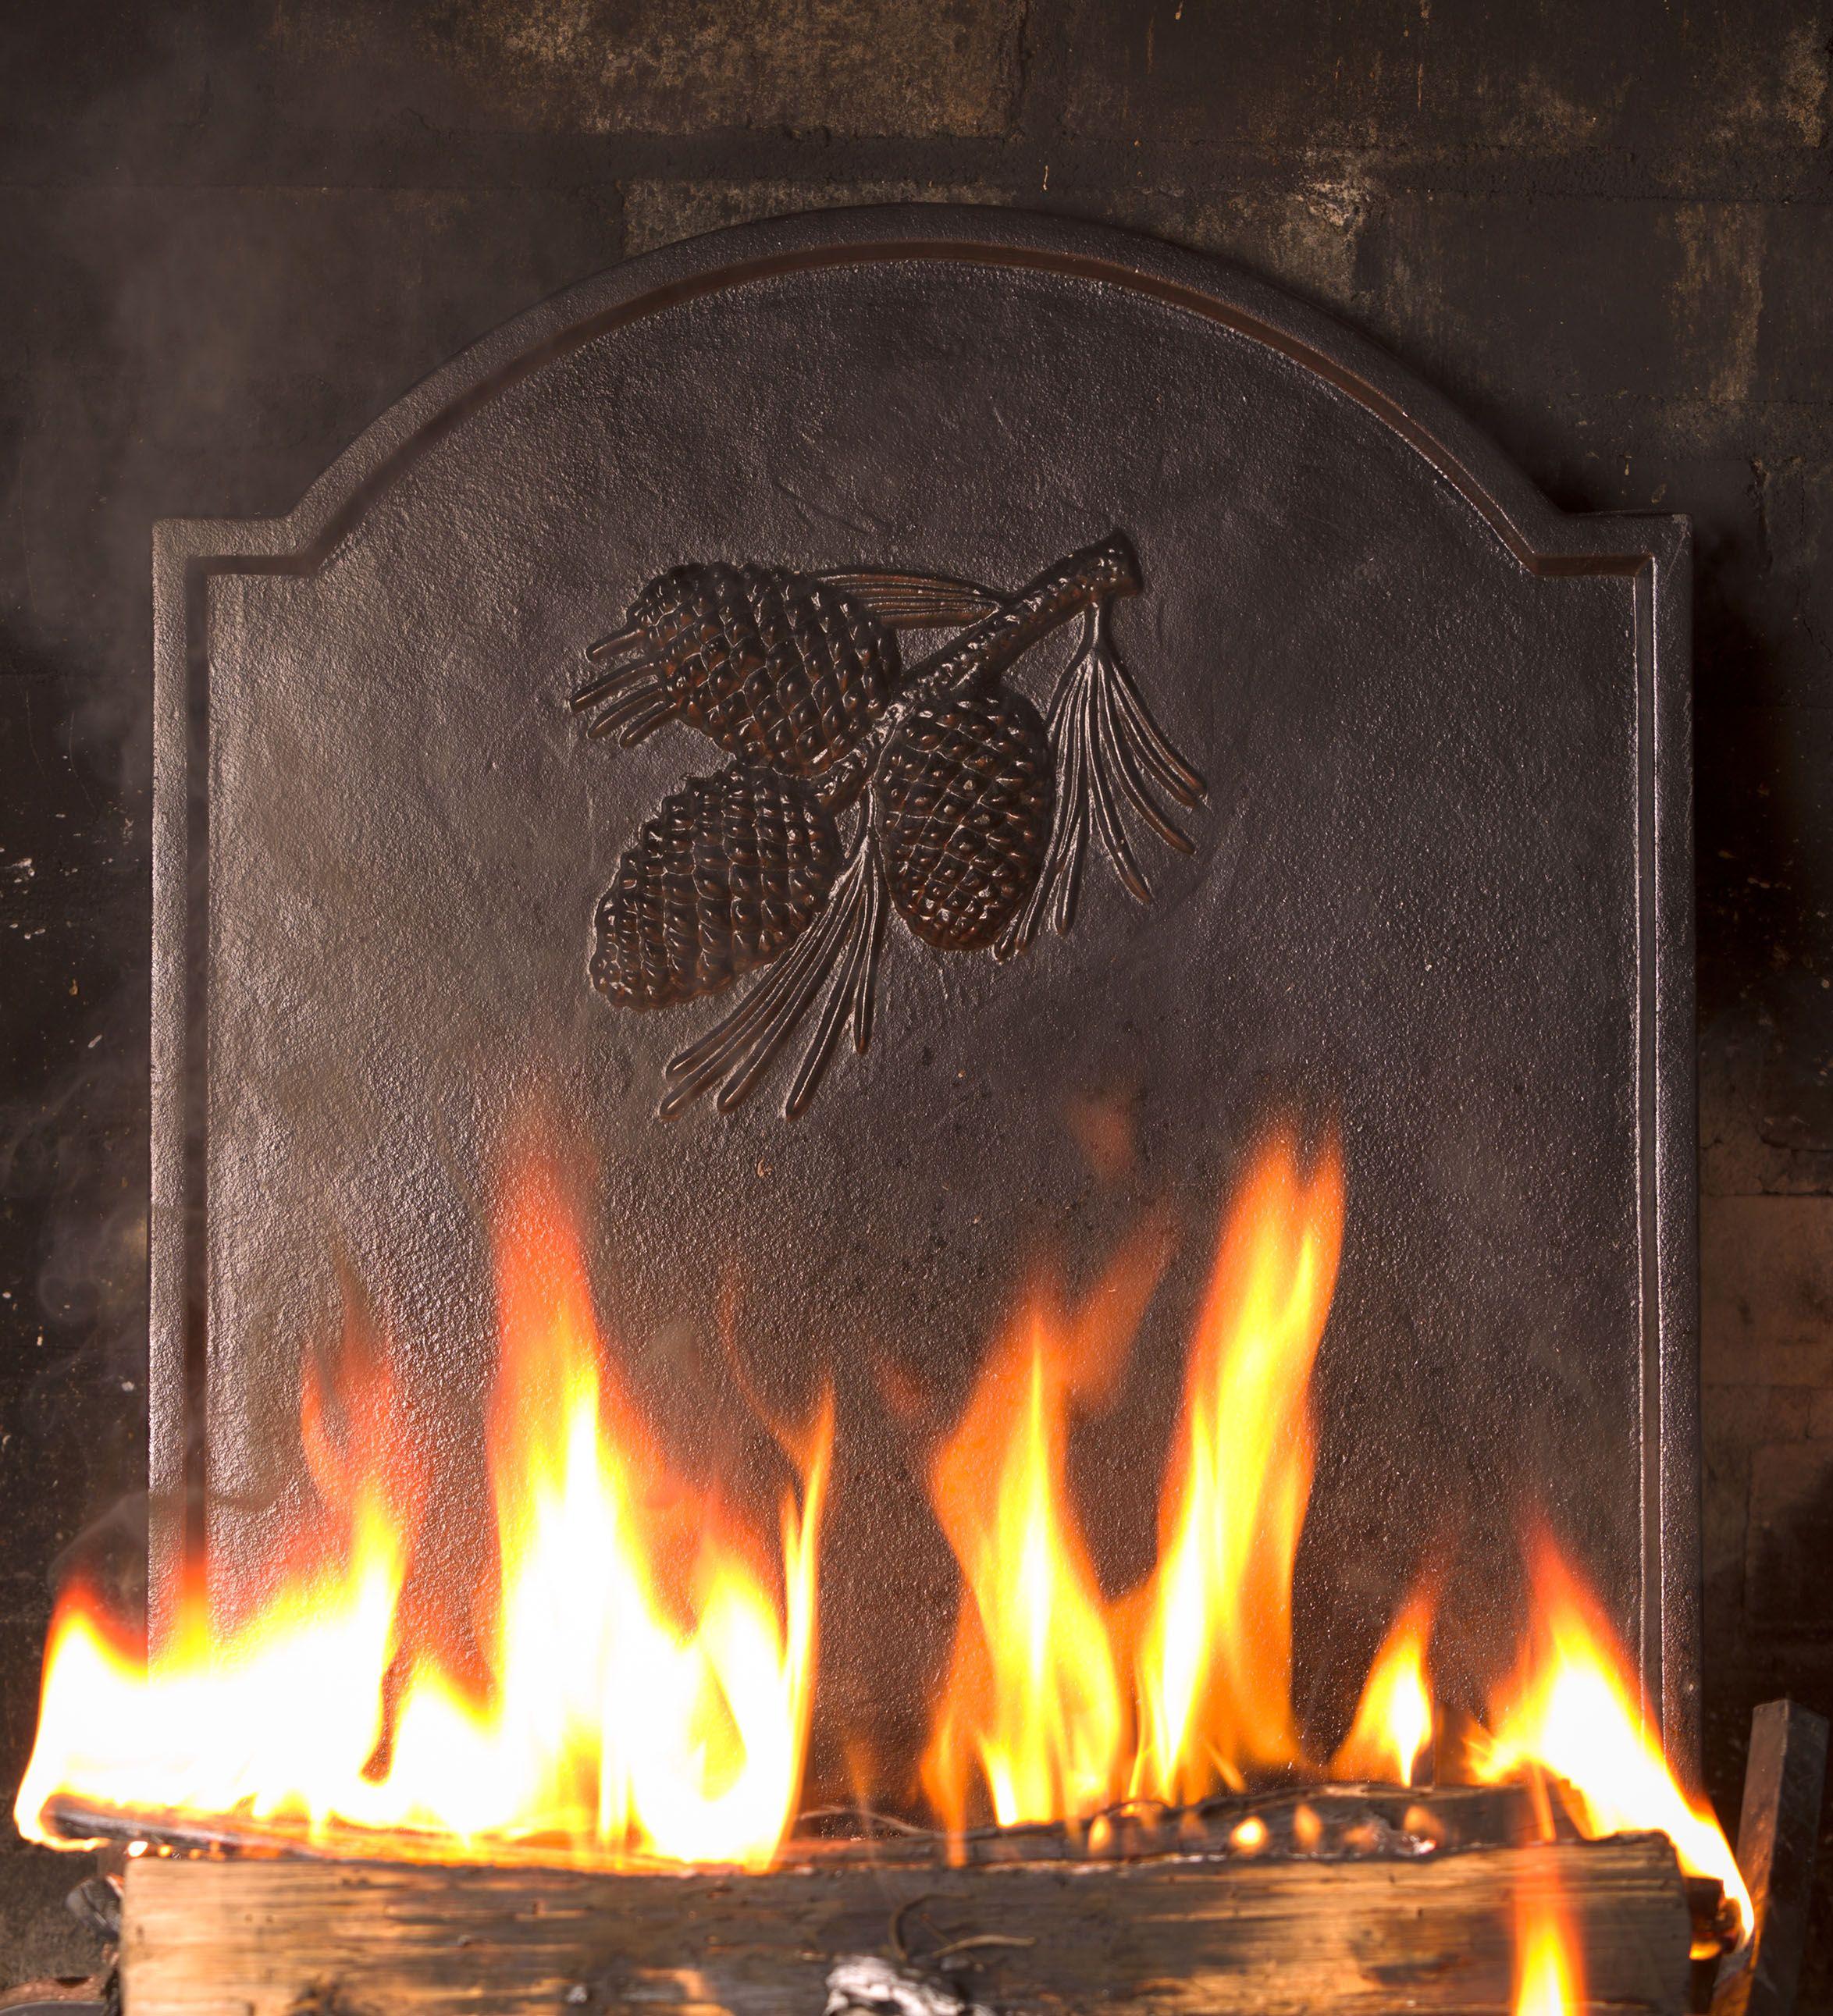 cast iron fireback grate pinecone pinterest pine cone pine